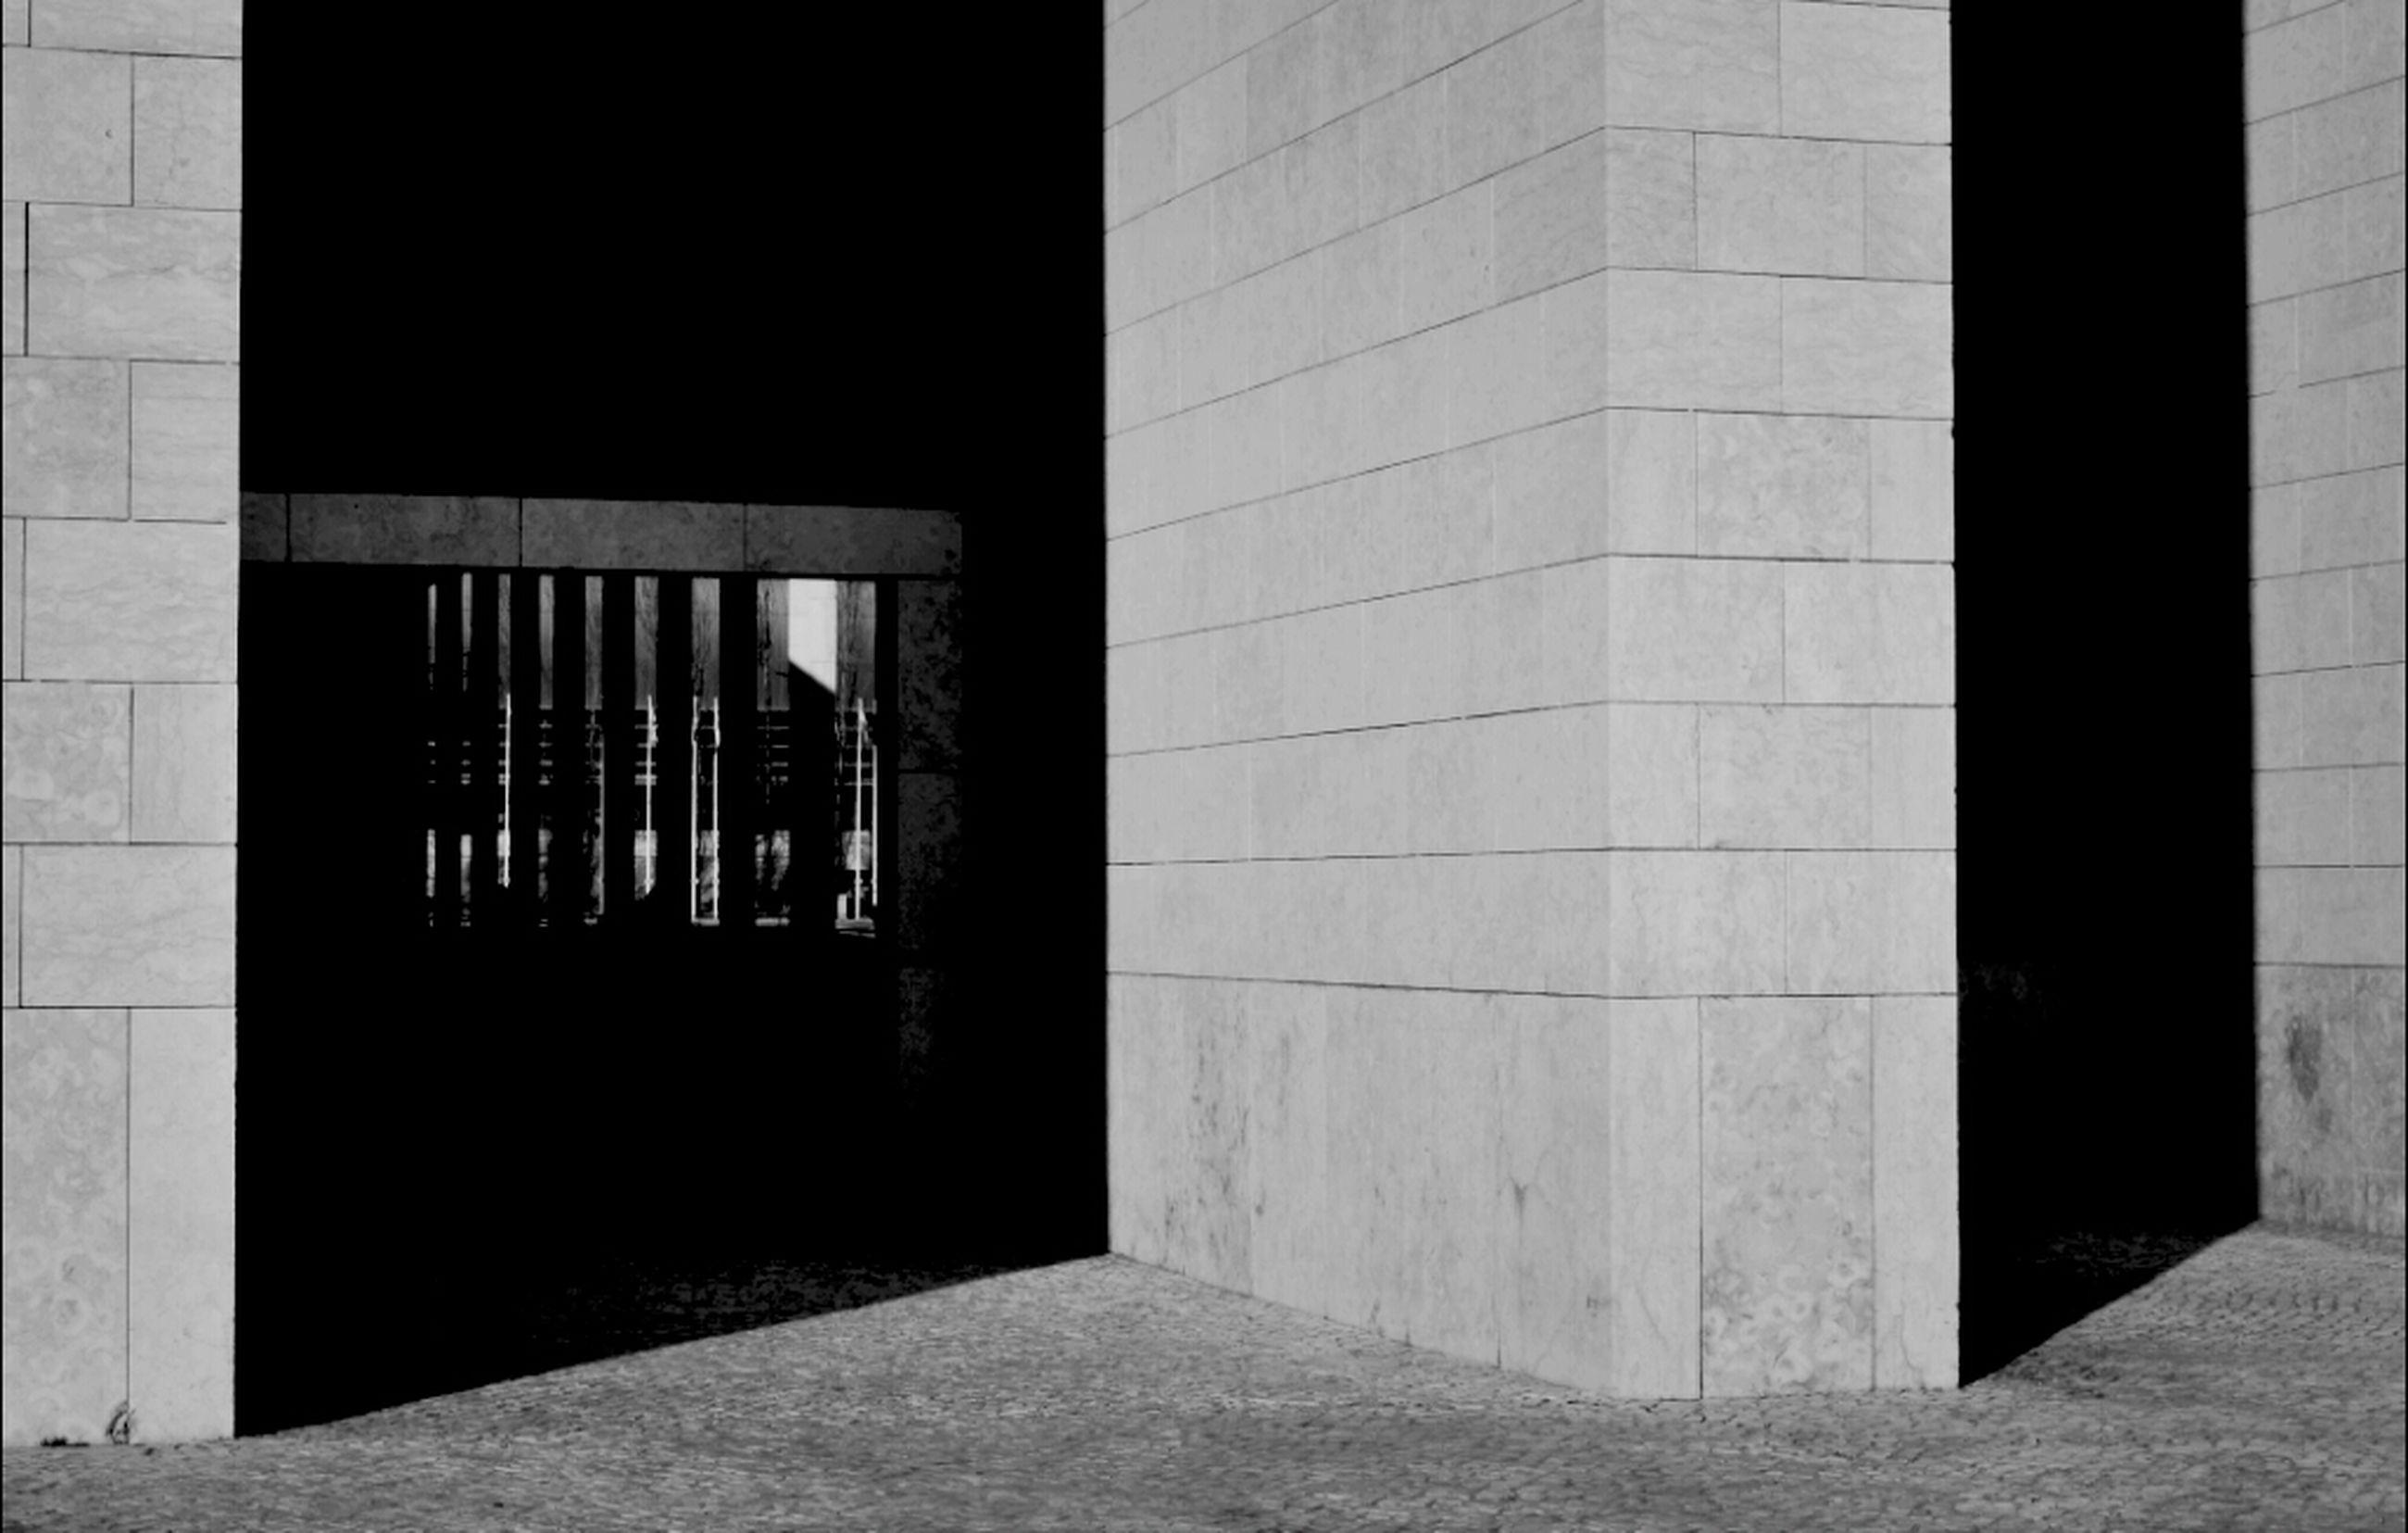 architecture, built structure, building exterior, window, building, city, wall - building feature, sunlight, shadow, indoors, door, day, wall, men, corridor, entrance, residential building, residential structure